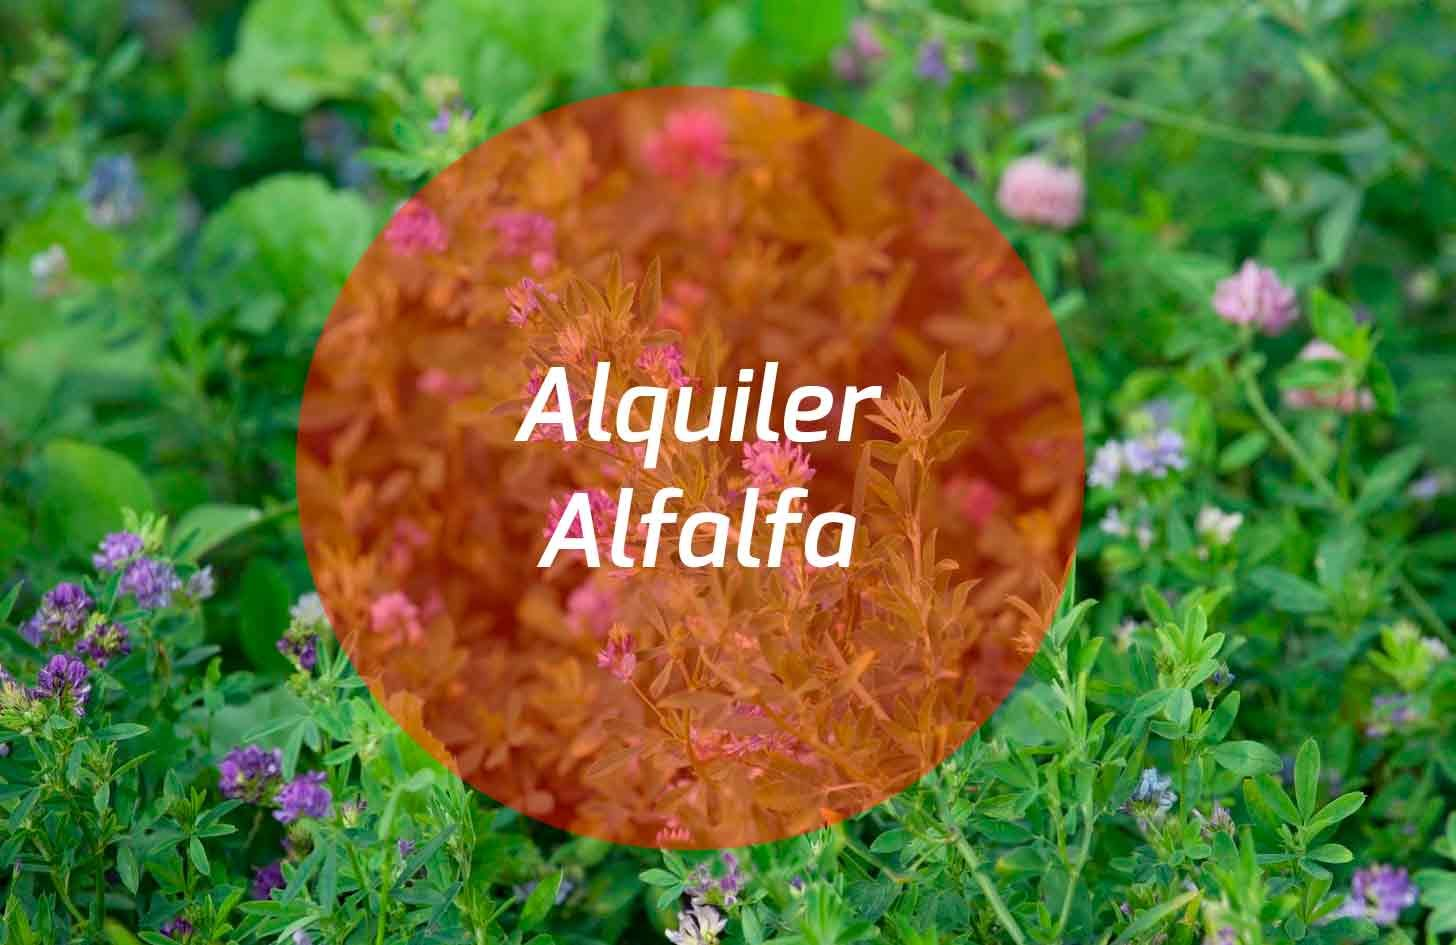 alquiler-alfalfa